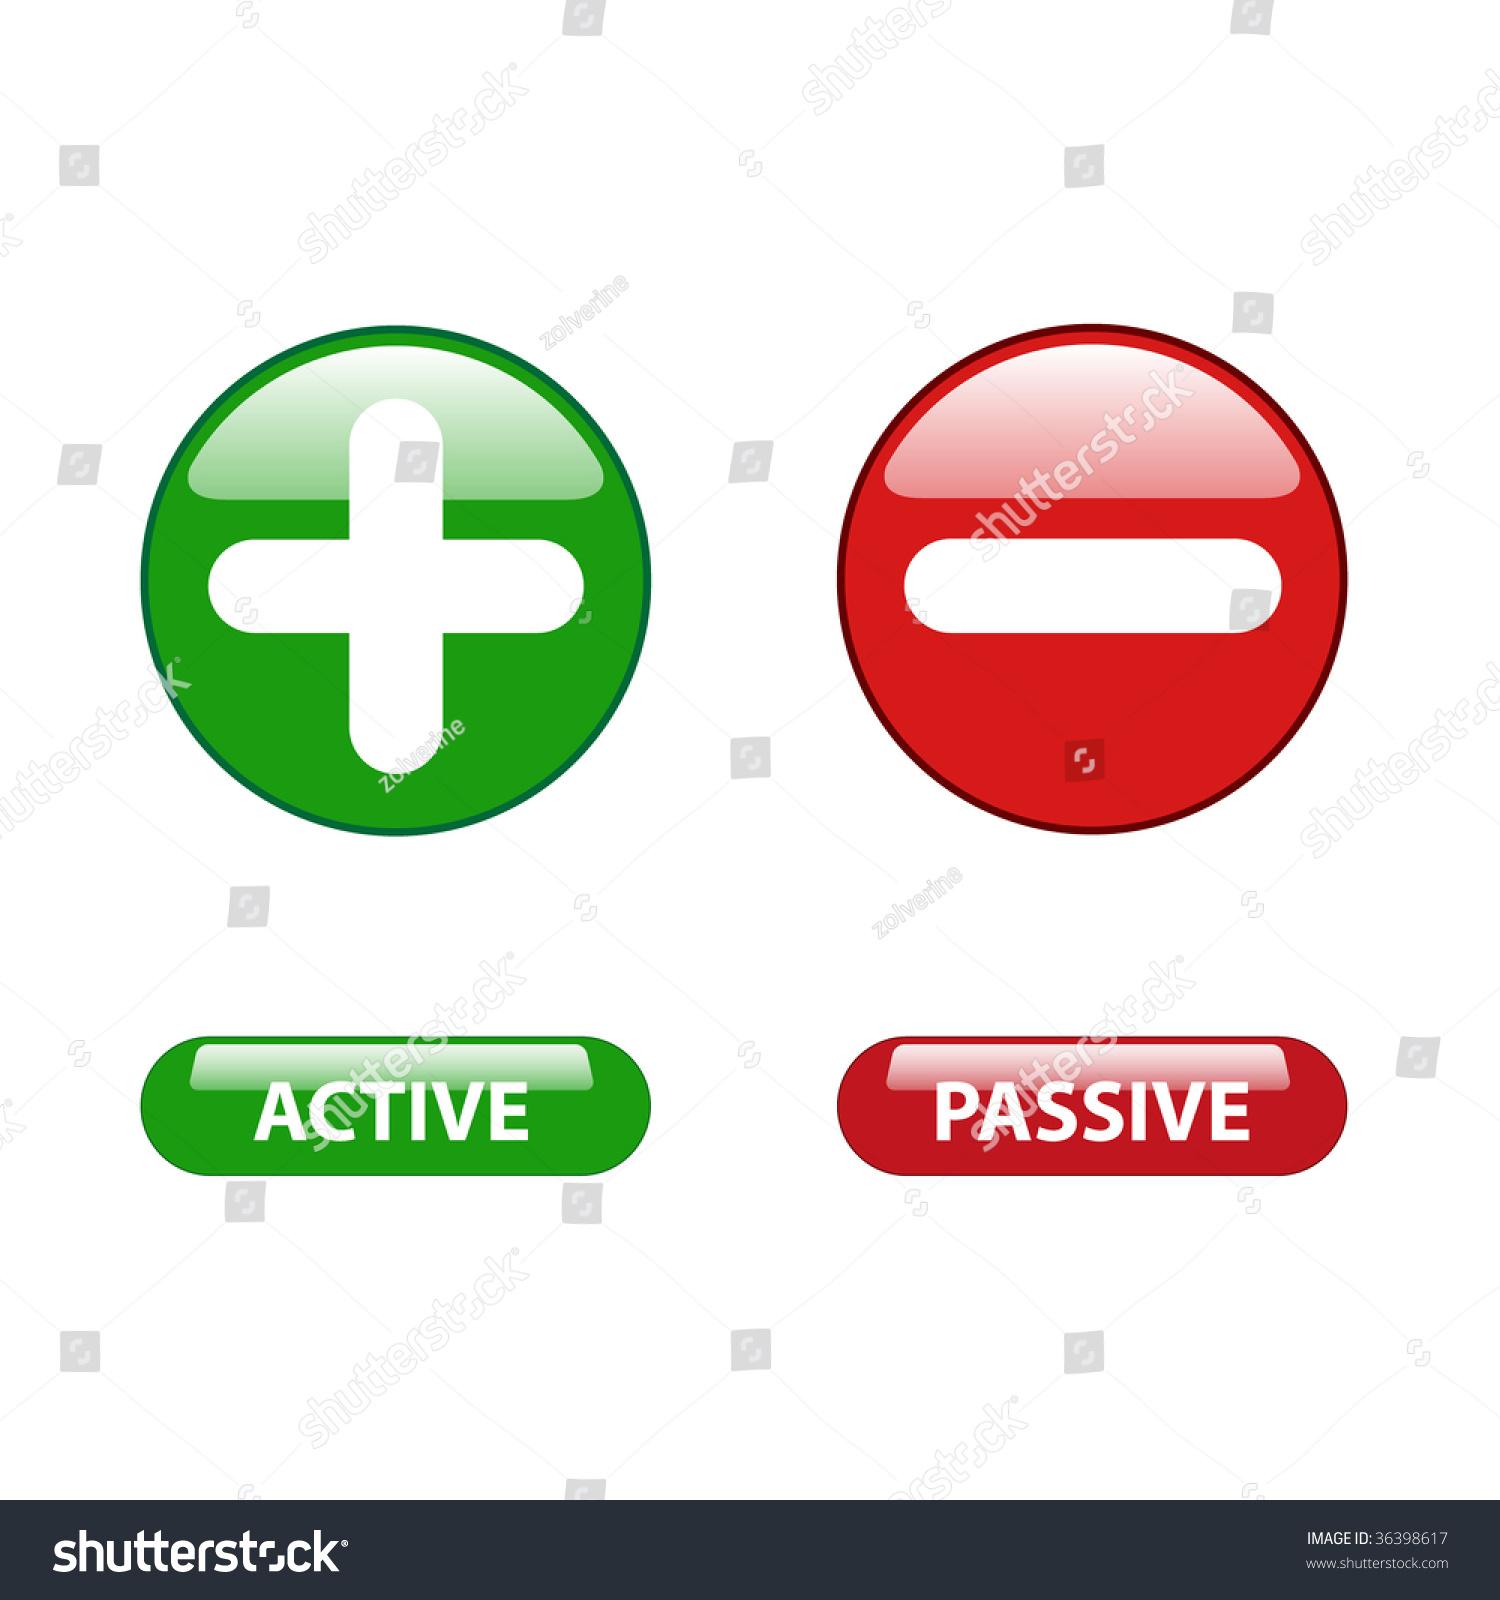 Active Worksheet Select Vba